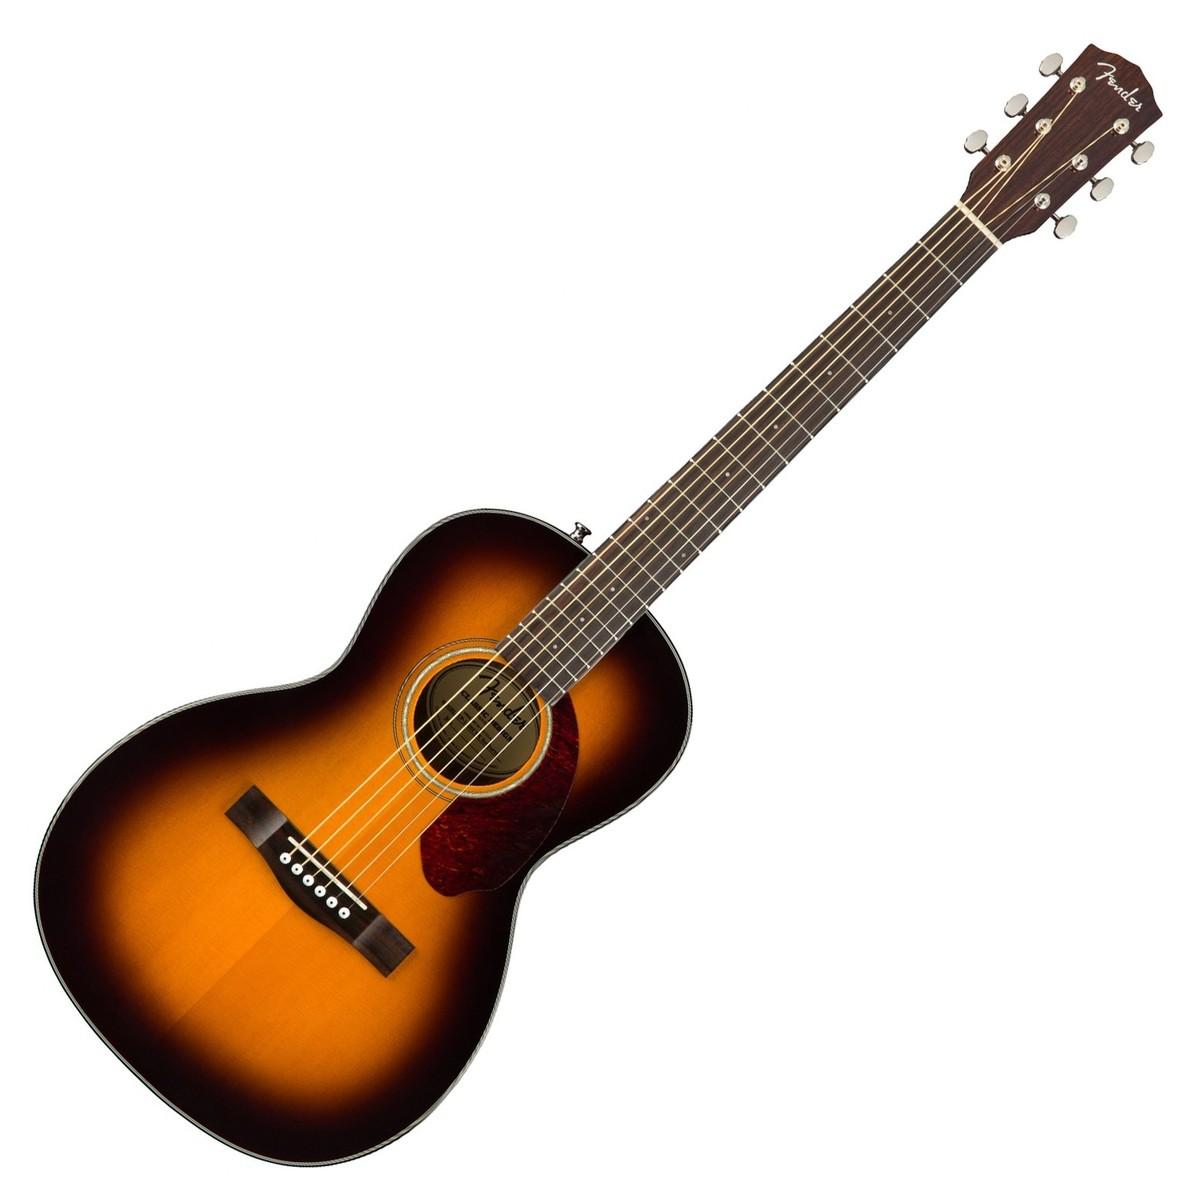 55800f4353b Fender CP-140SE Acoustic Guitar, Sunburst With Case. Loading zoom